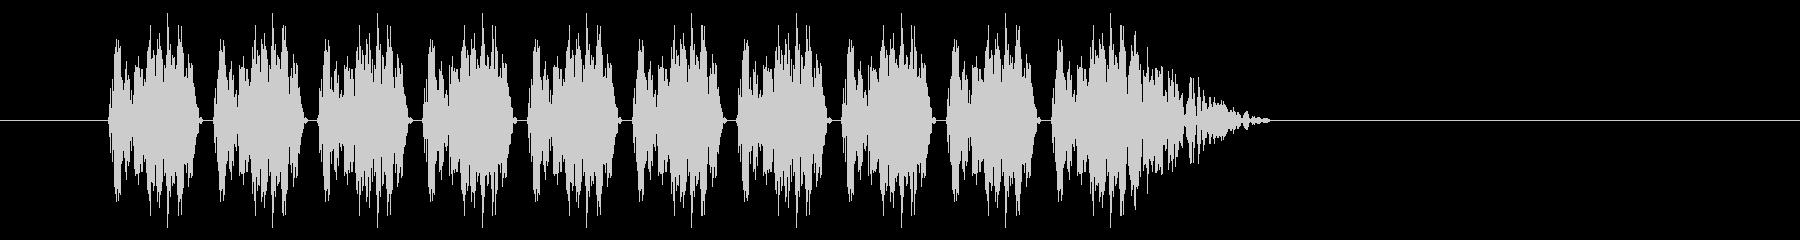 SNES シューティング01-02(発射の未再生の波形